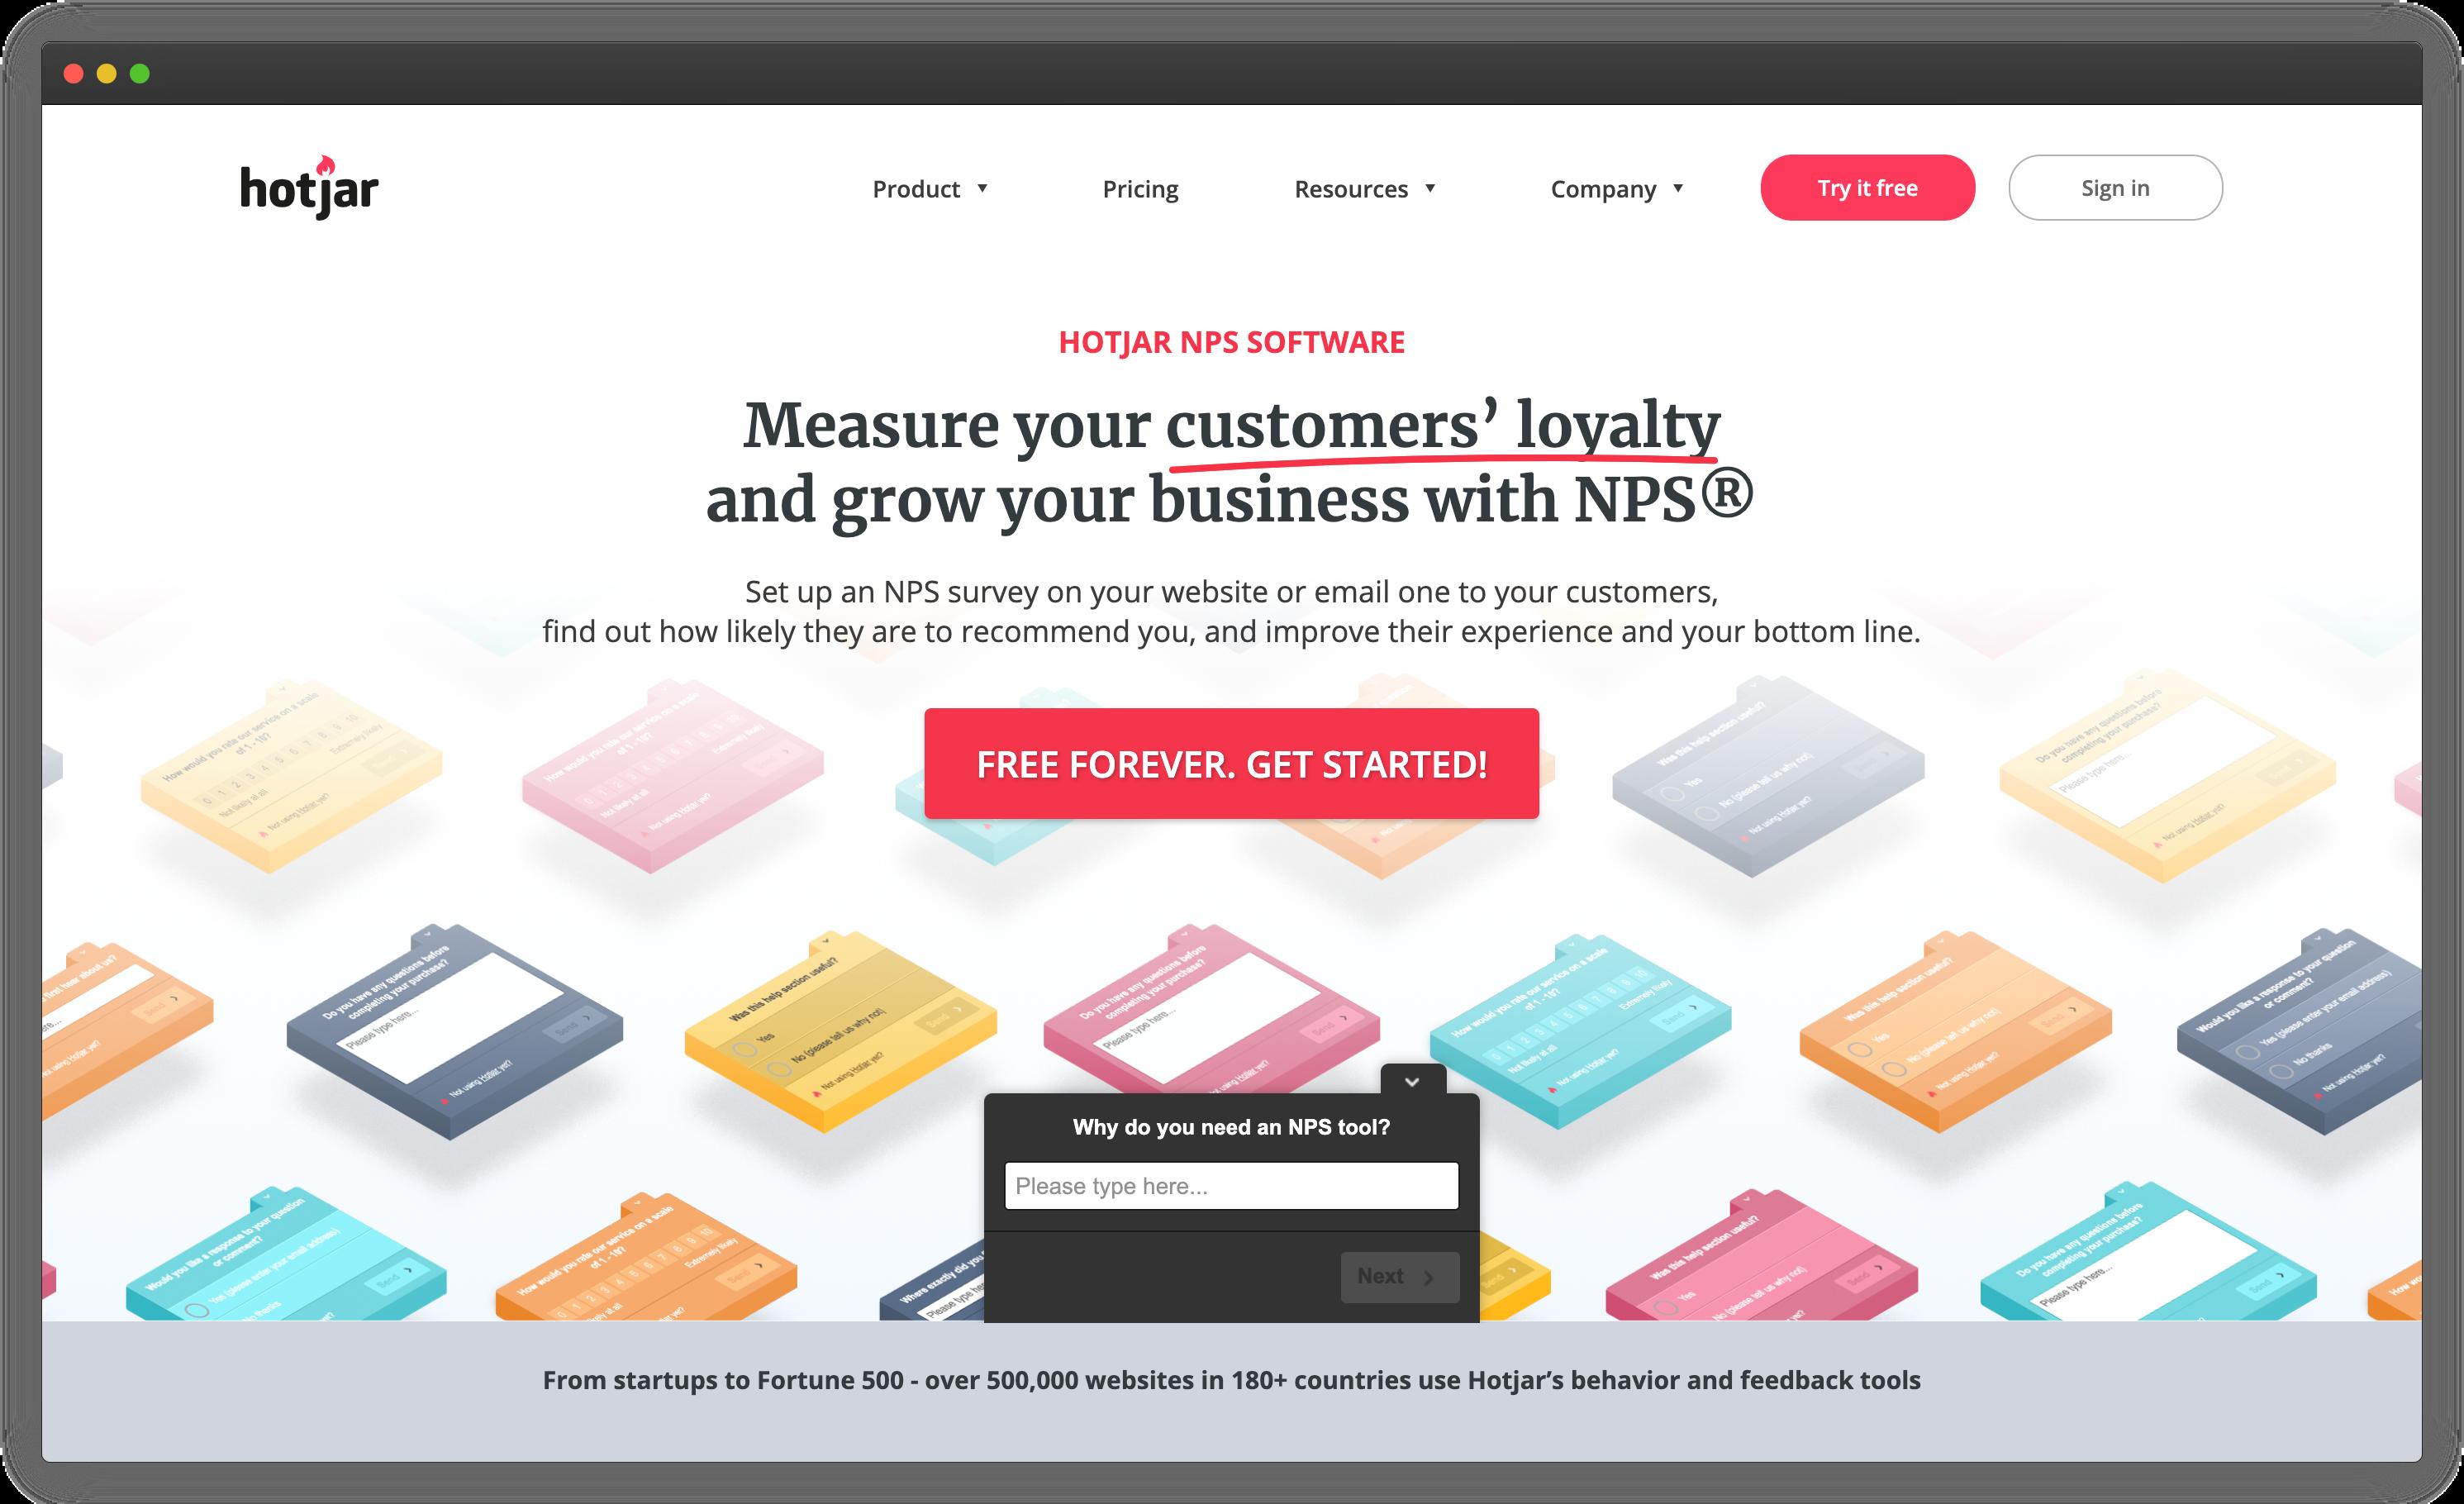 Hotjar - NPS Software